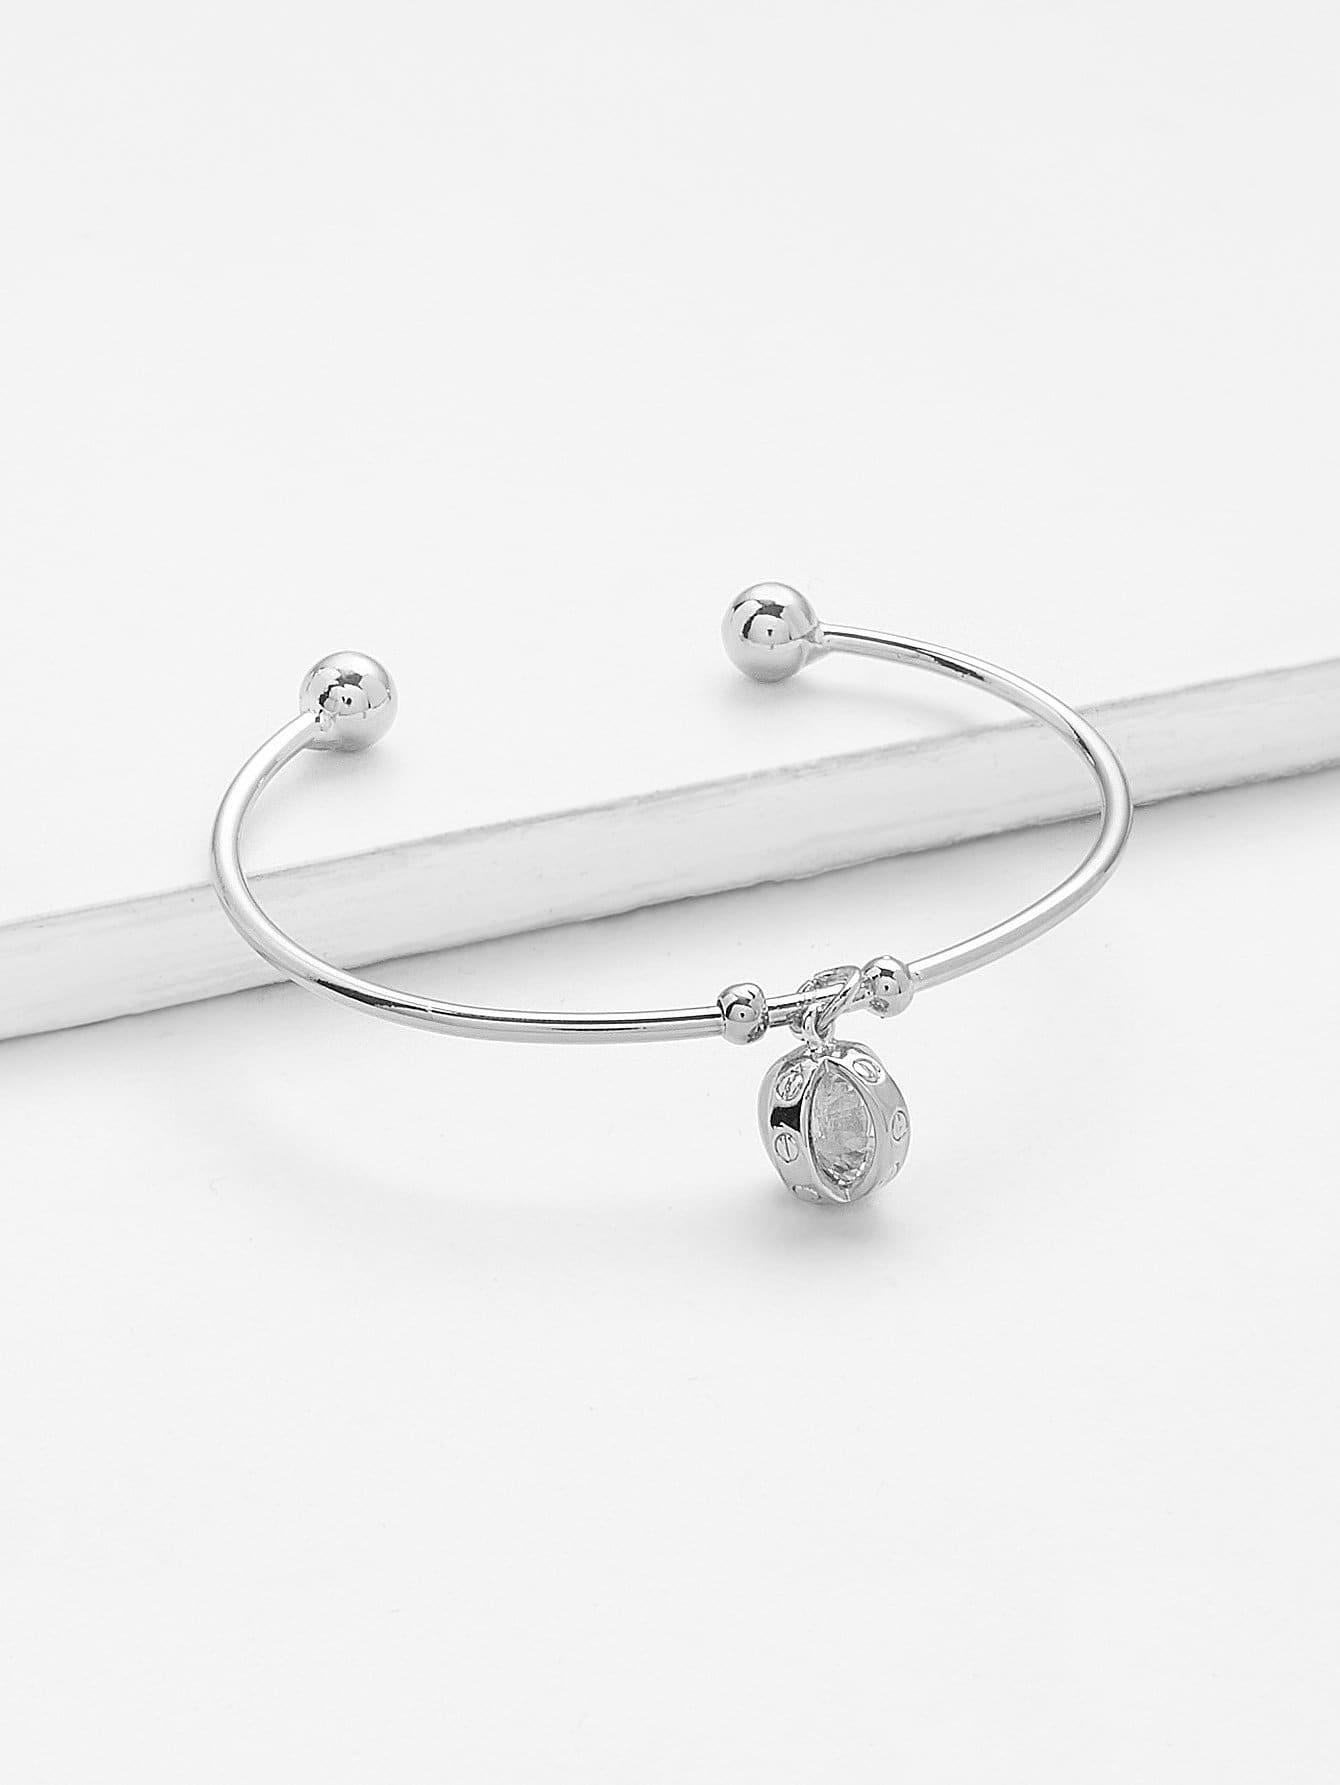 Charm Detail Cuff Bangle beaded detail heart charm bangle